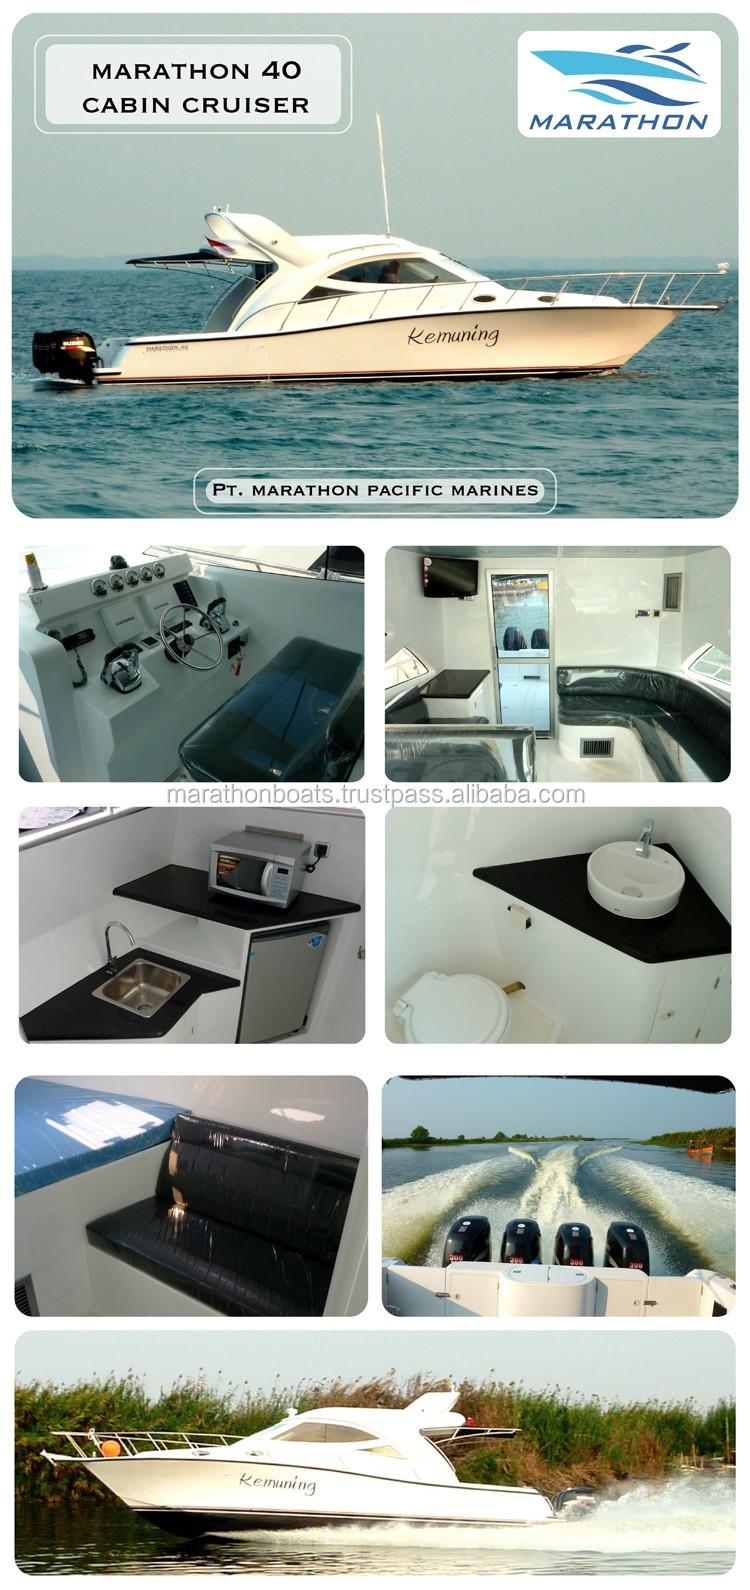 Brand New Marathon 40 Cabin Cruiser Luxury Boat From